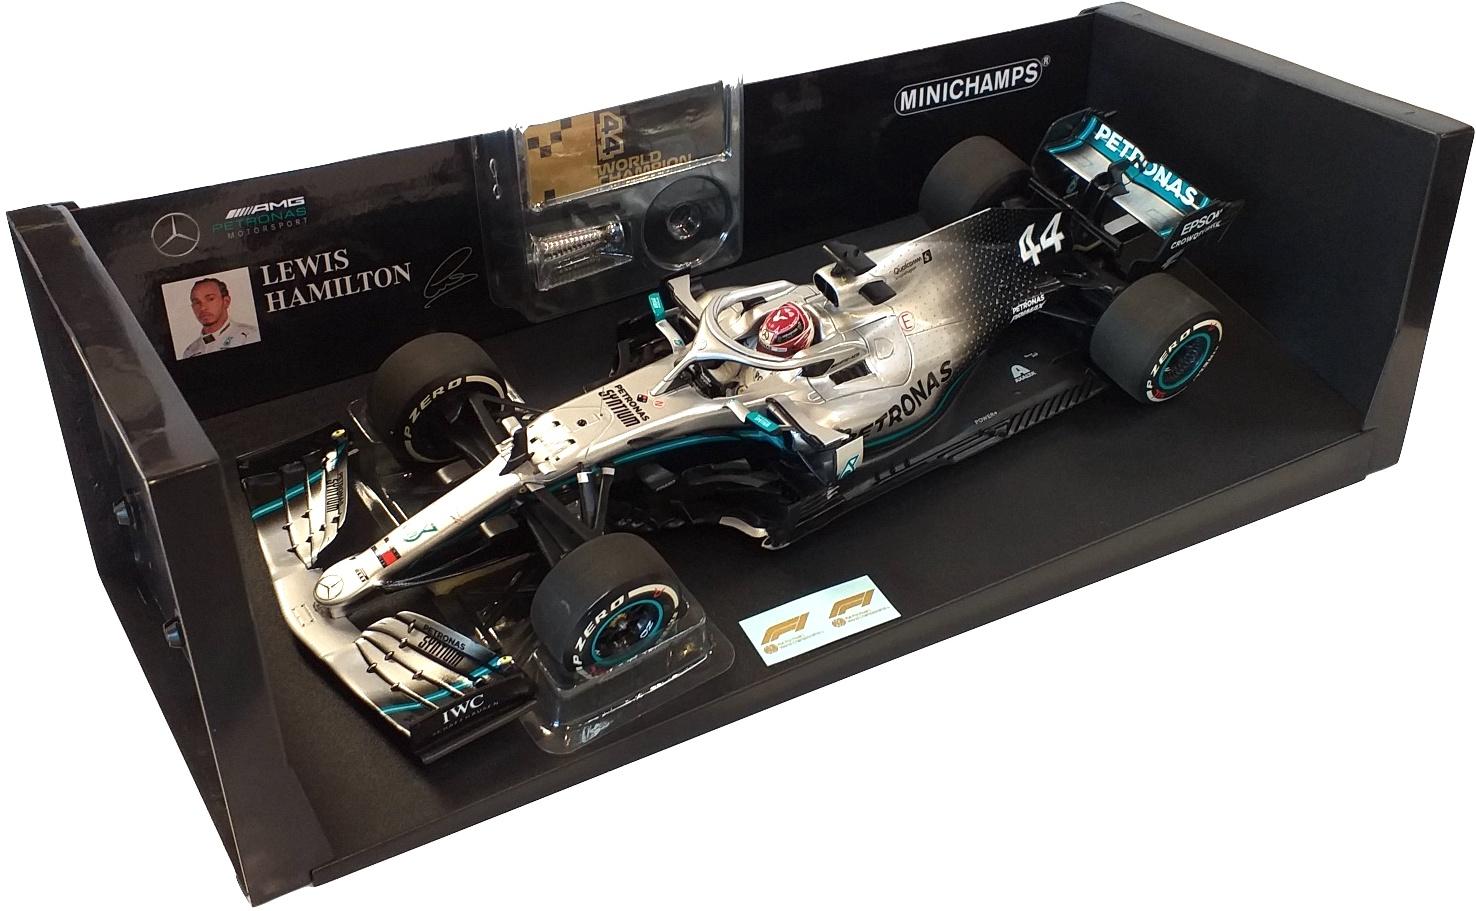 Louis Hamilton World Champion USA Gp 2019 Mercedes-AMG Petronas Motorsport 1/18